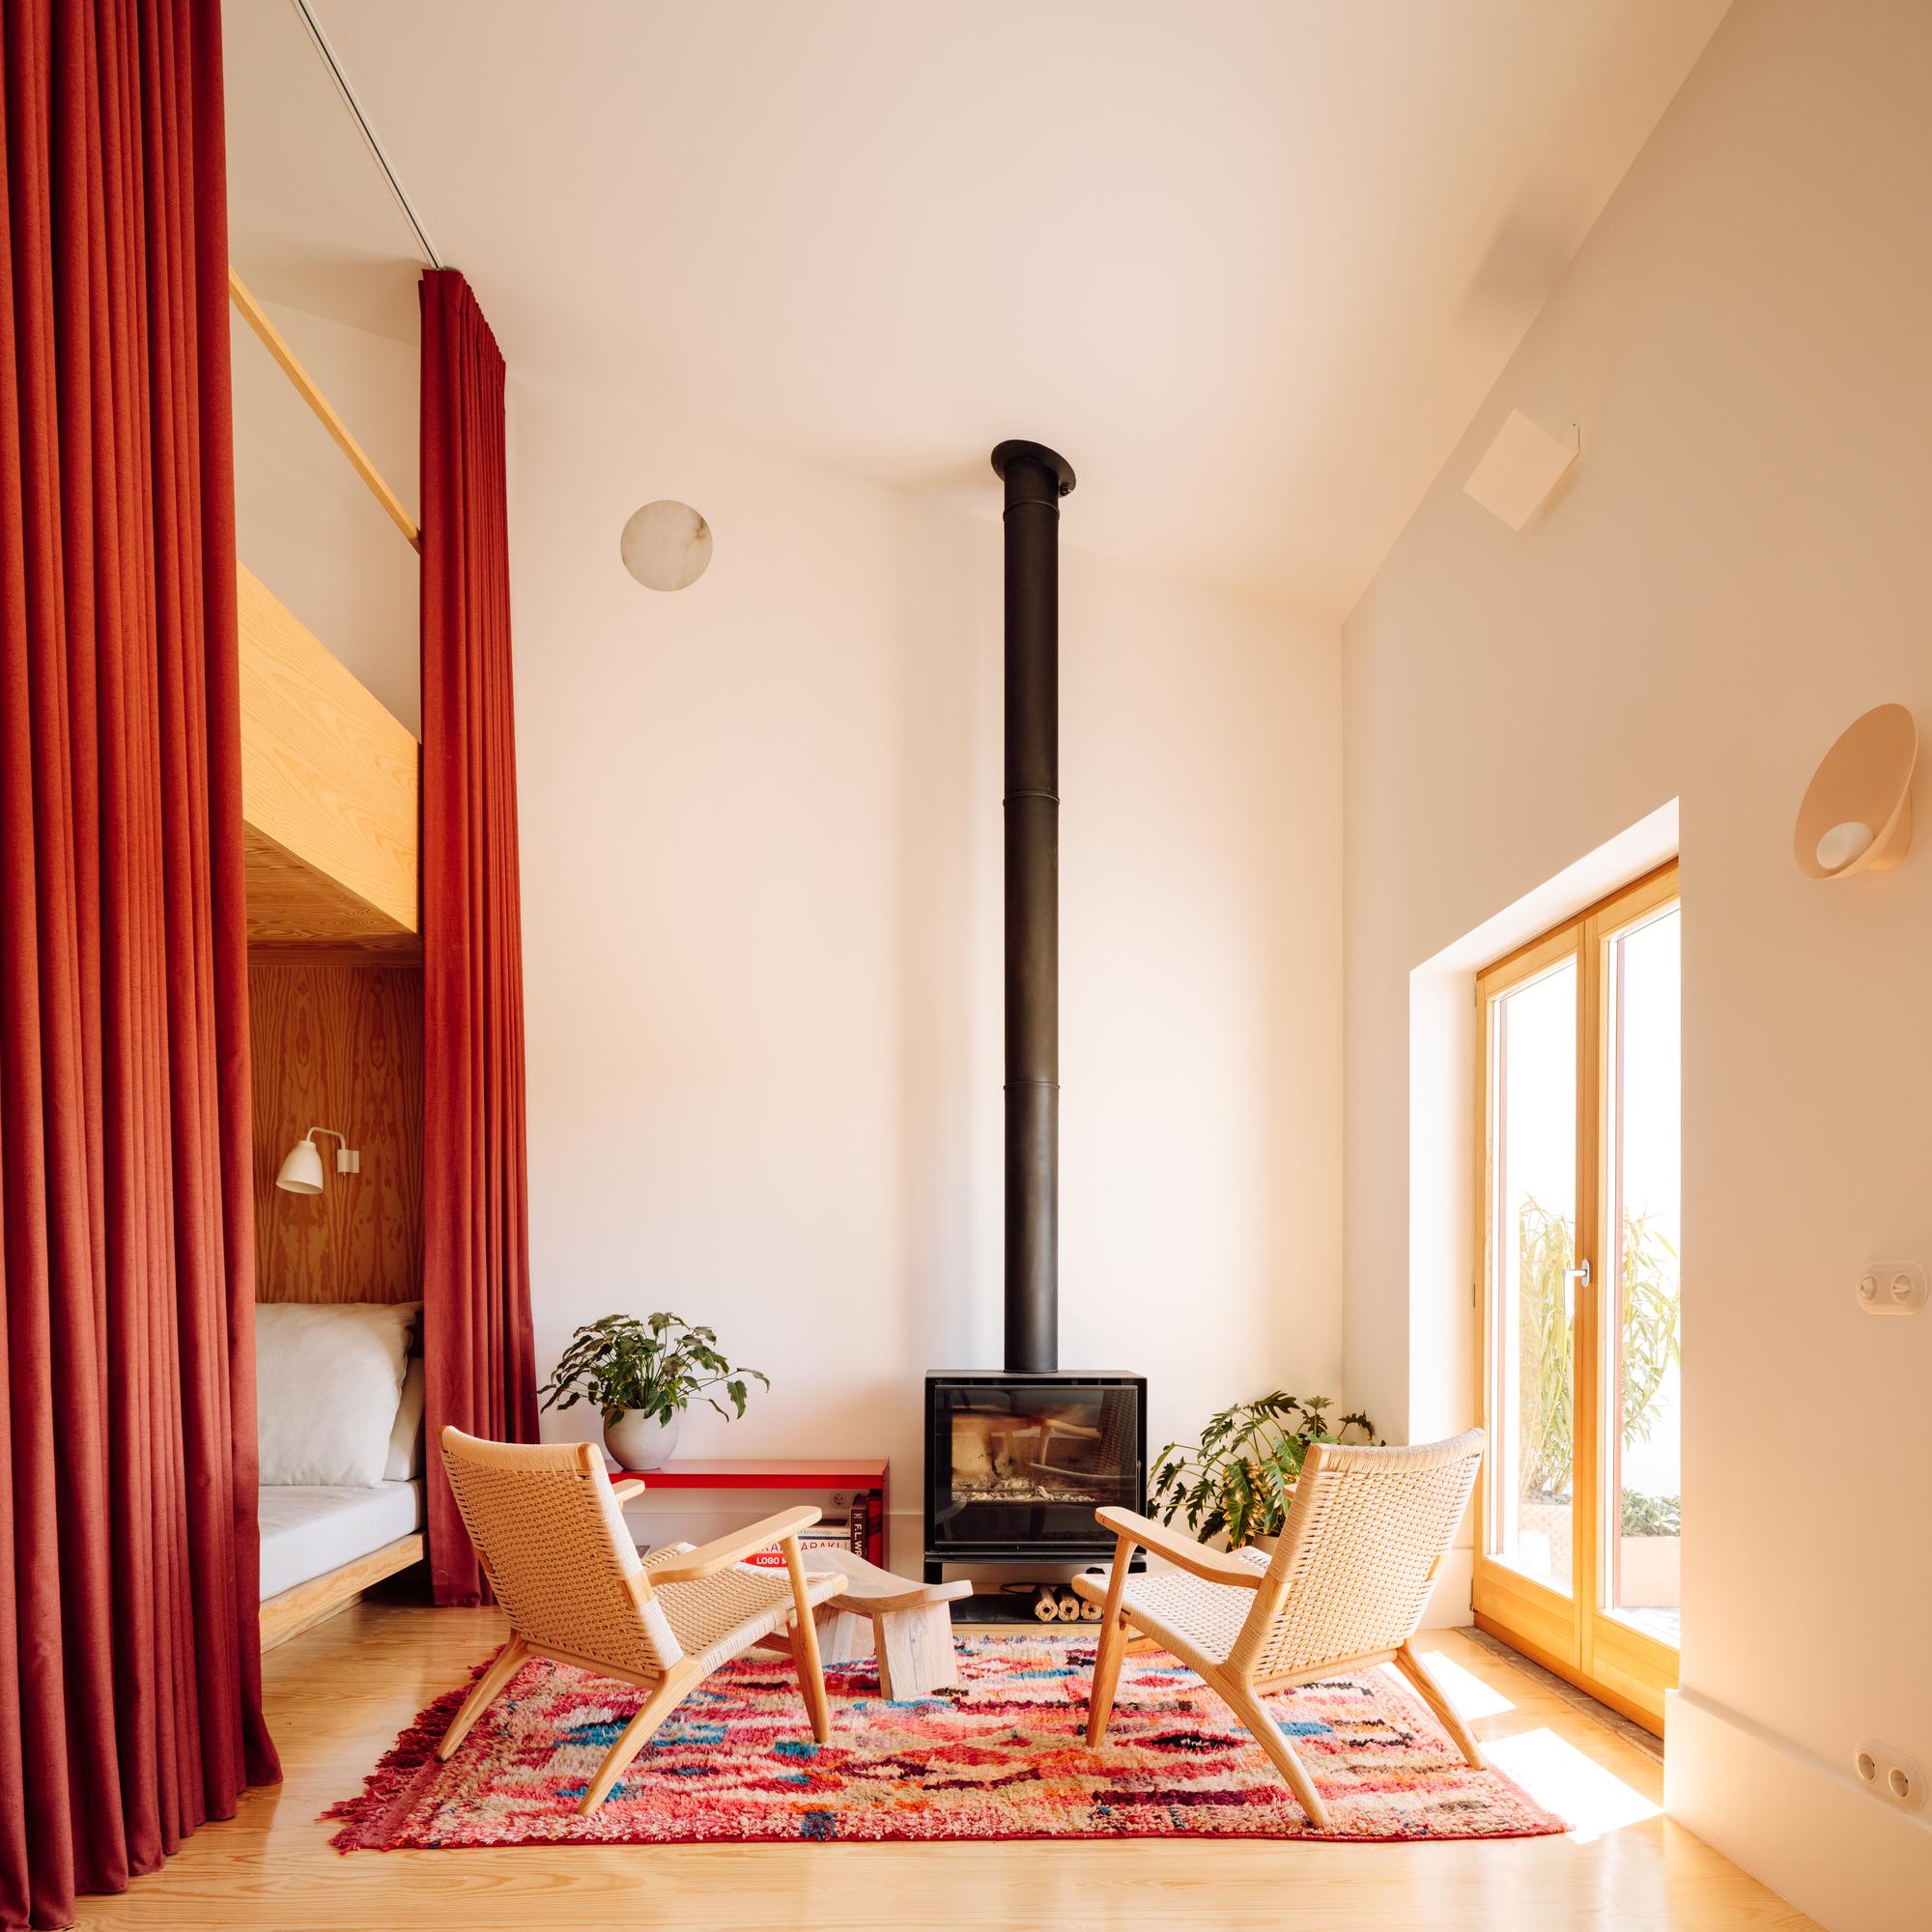 Gallery Of Apartment In Santa Cruz / Bala Atelier